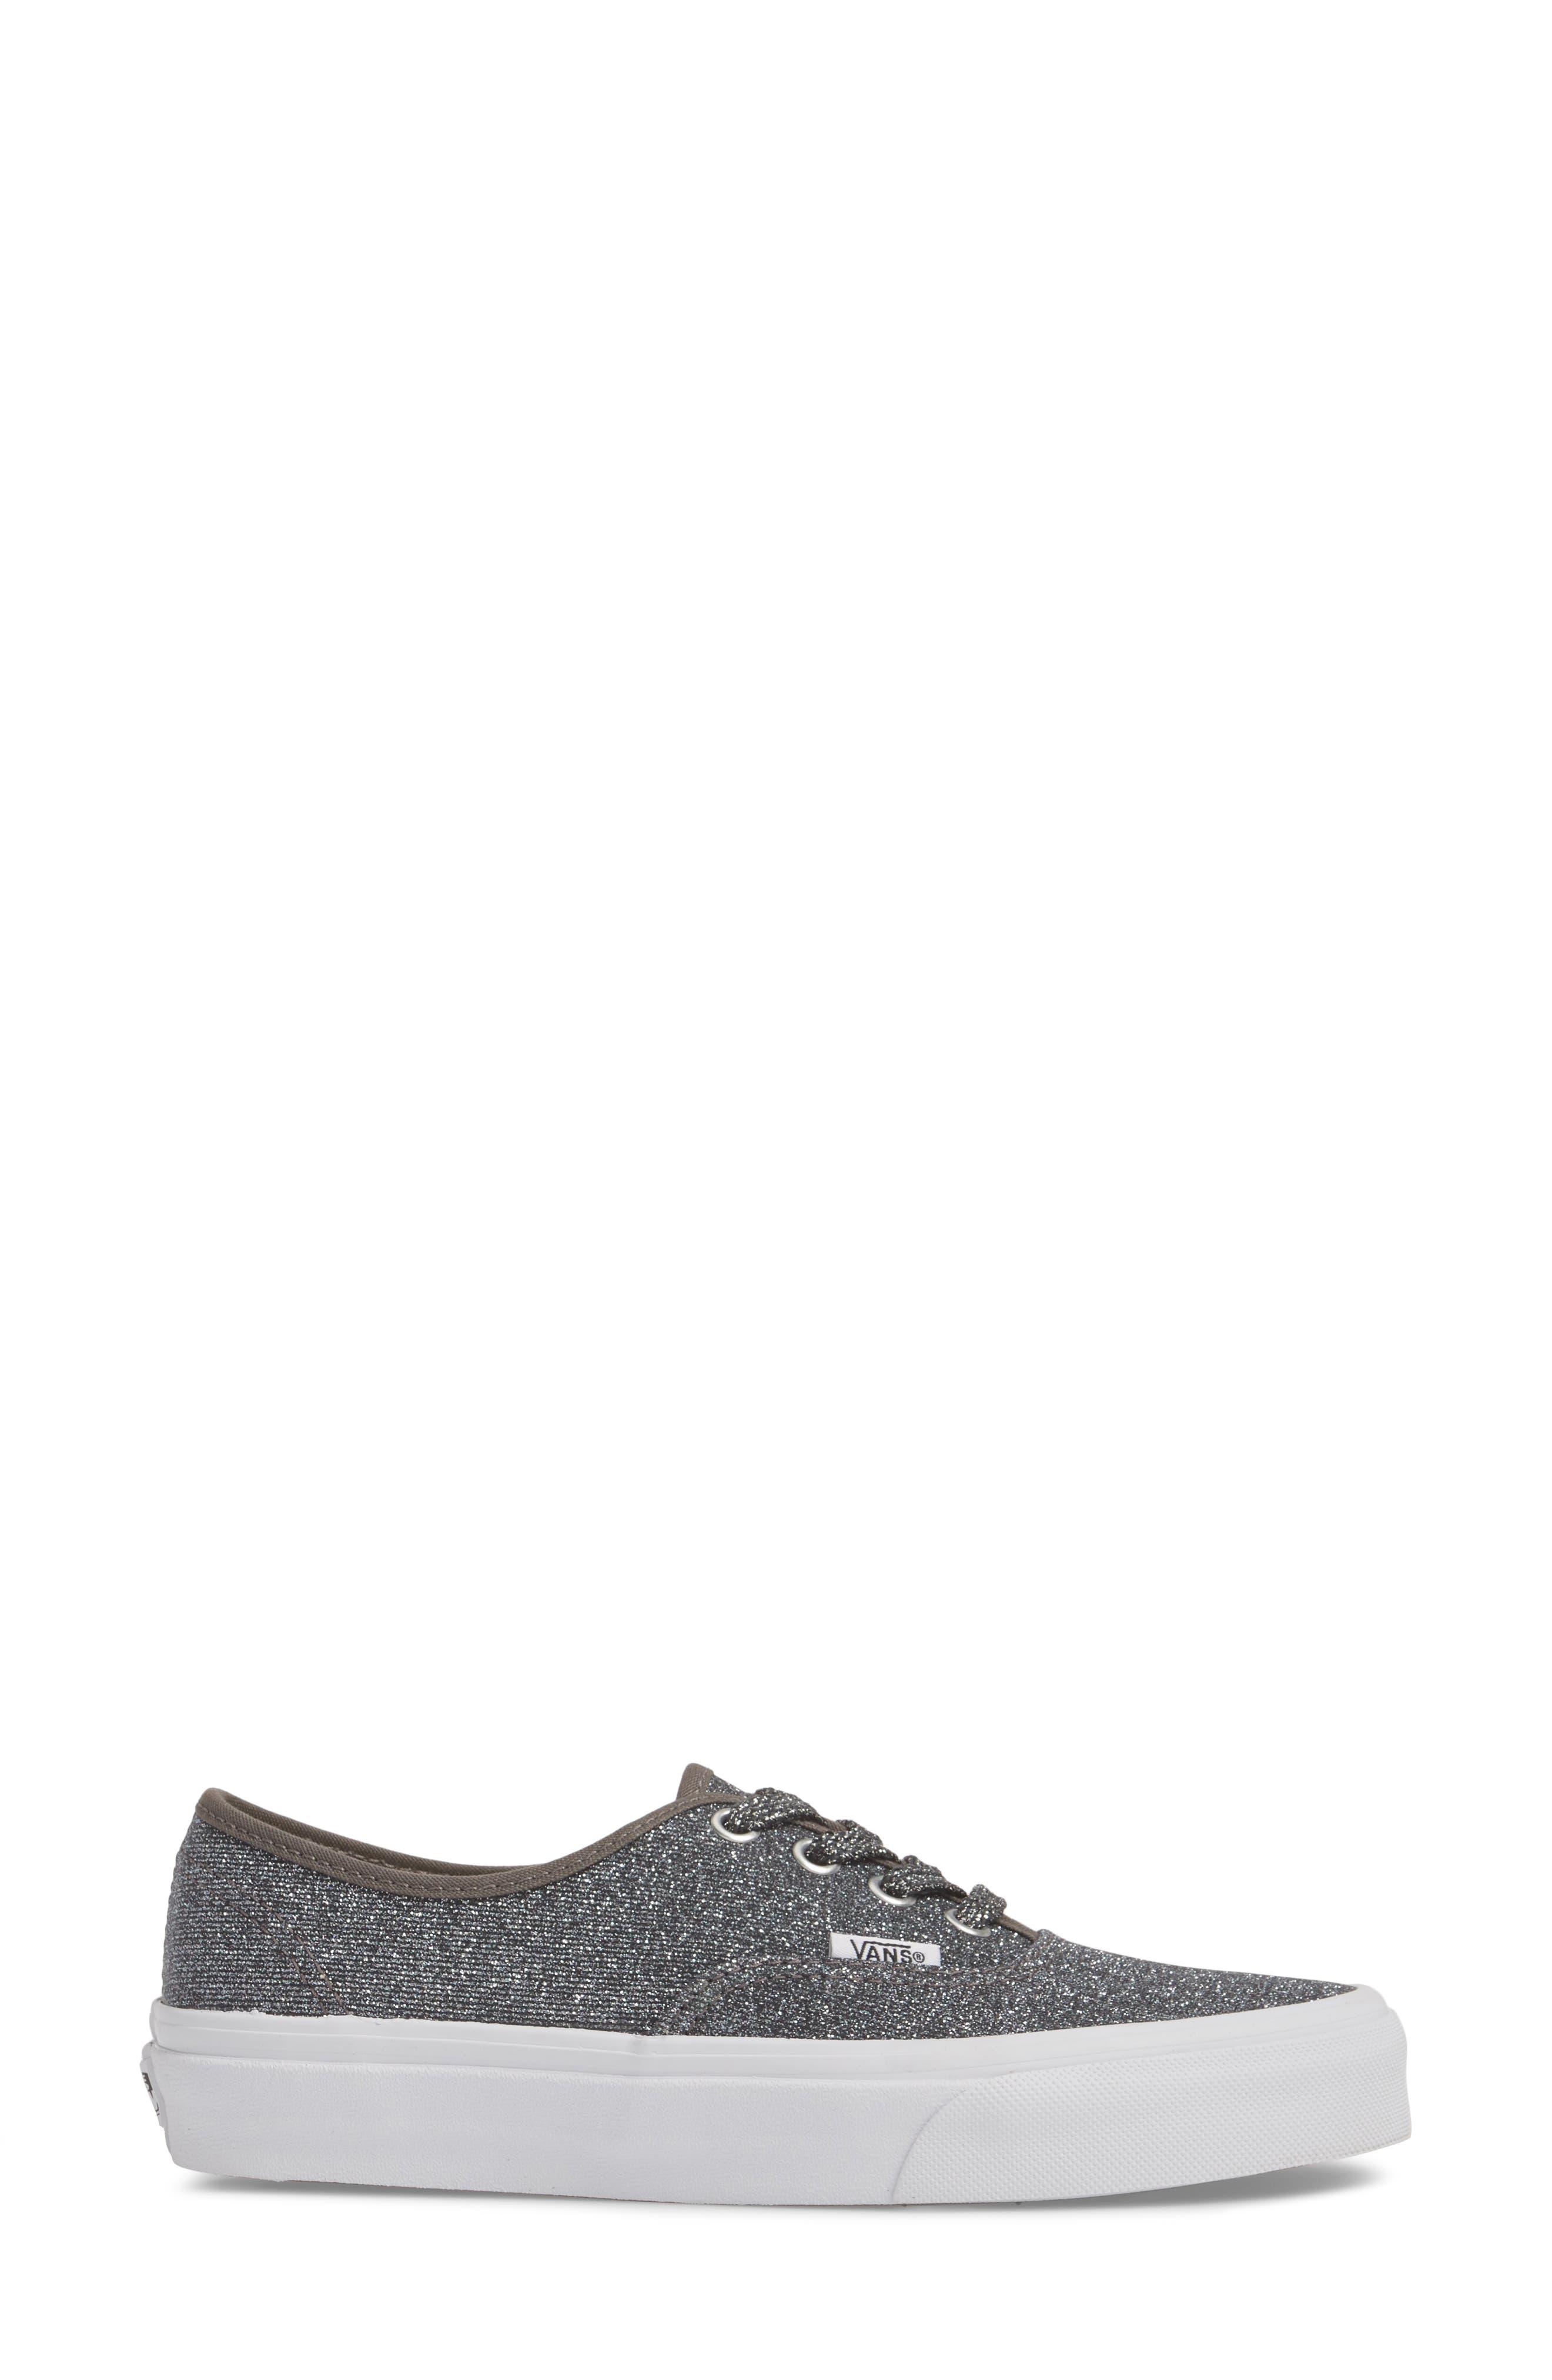 UA Authentic Lurex Sneaker,                             Alternate thumbnail 3, color,                             BLACK/ TRUE WHITE GLITTER